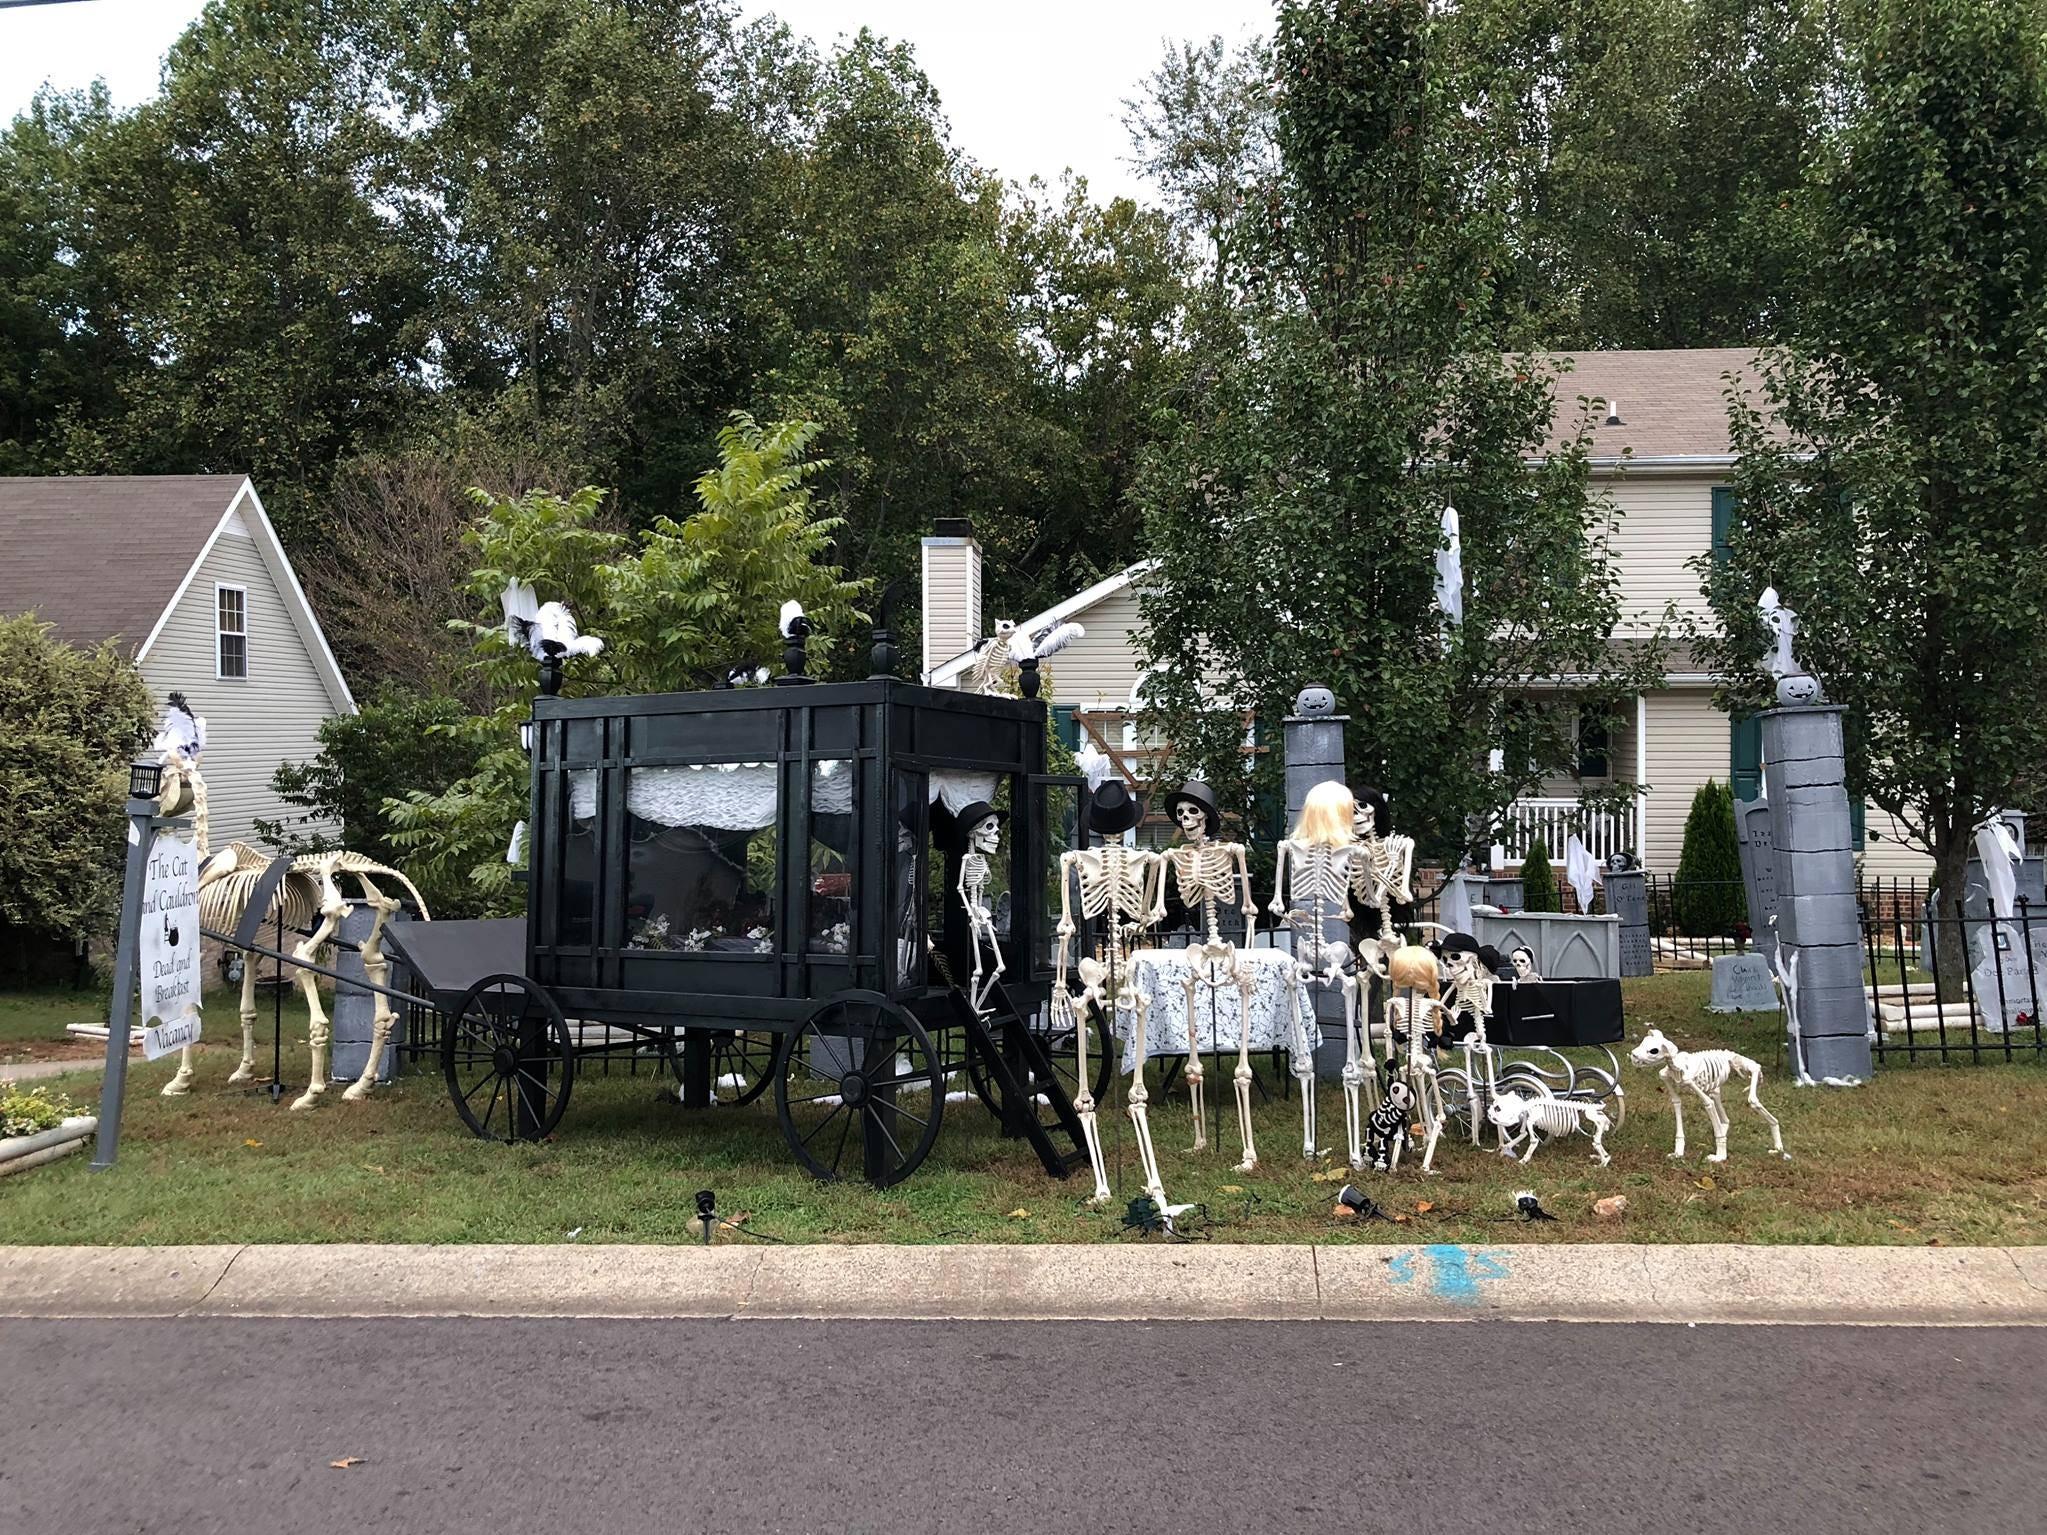 The Esqueletos arrive for a visit